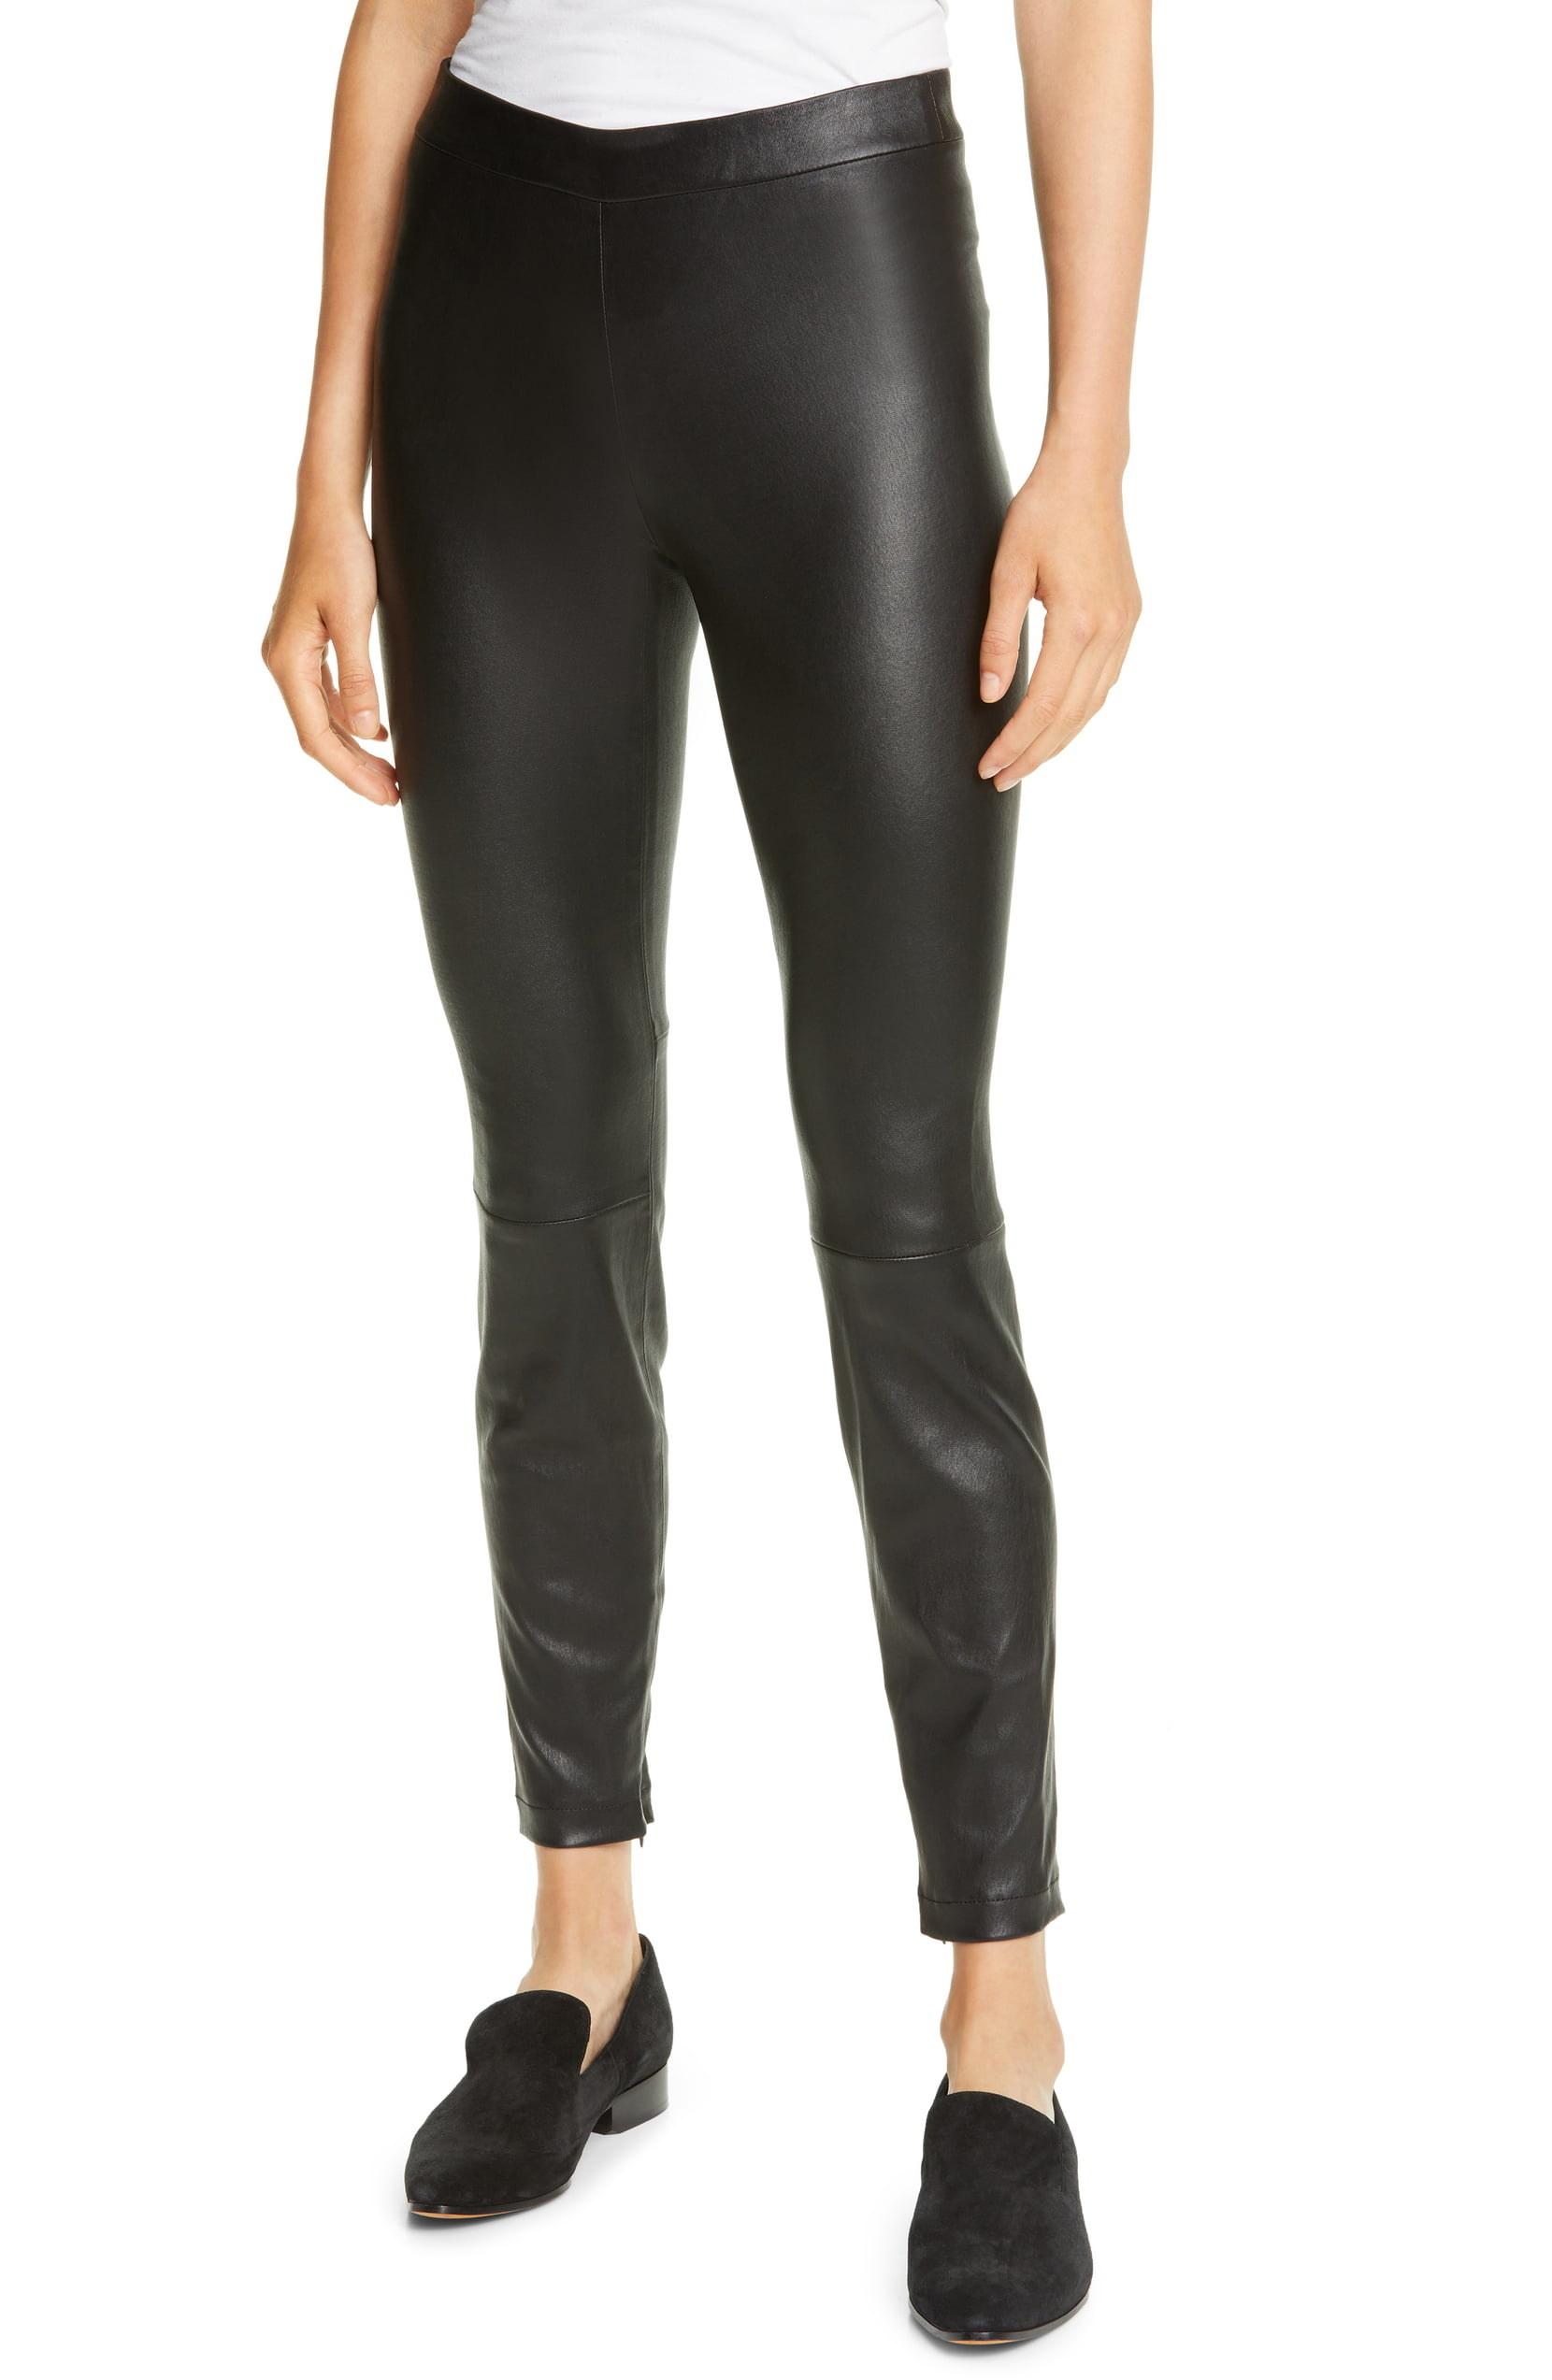 Model wearing the black leather leggings